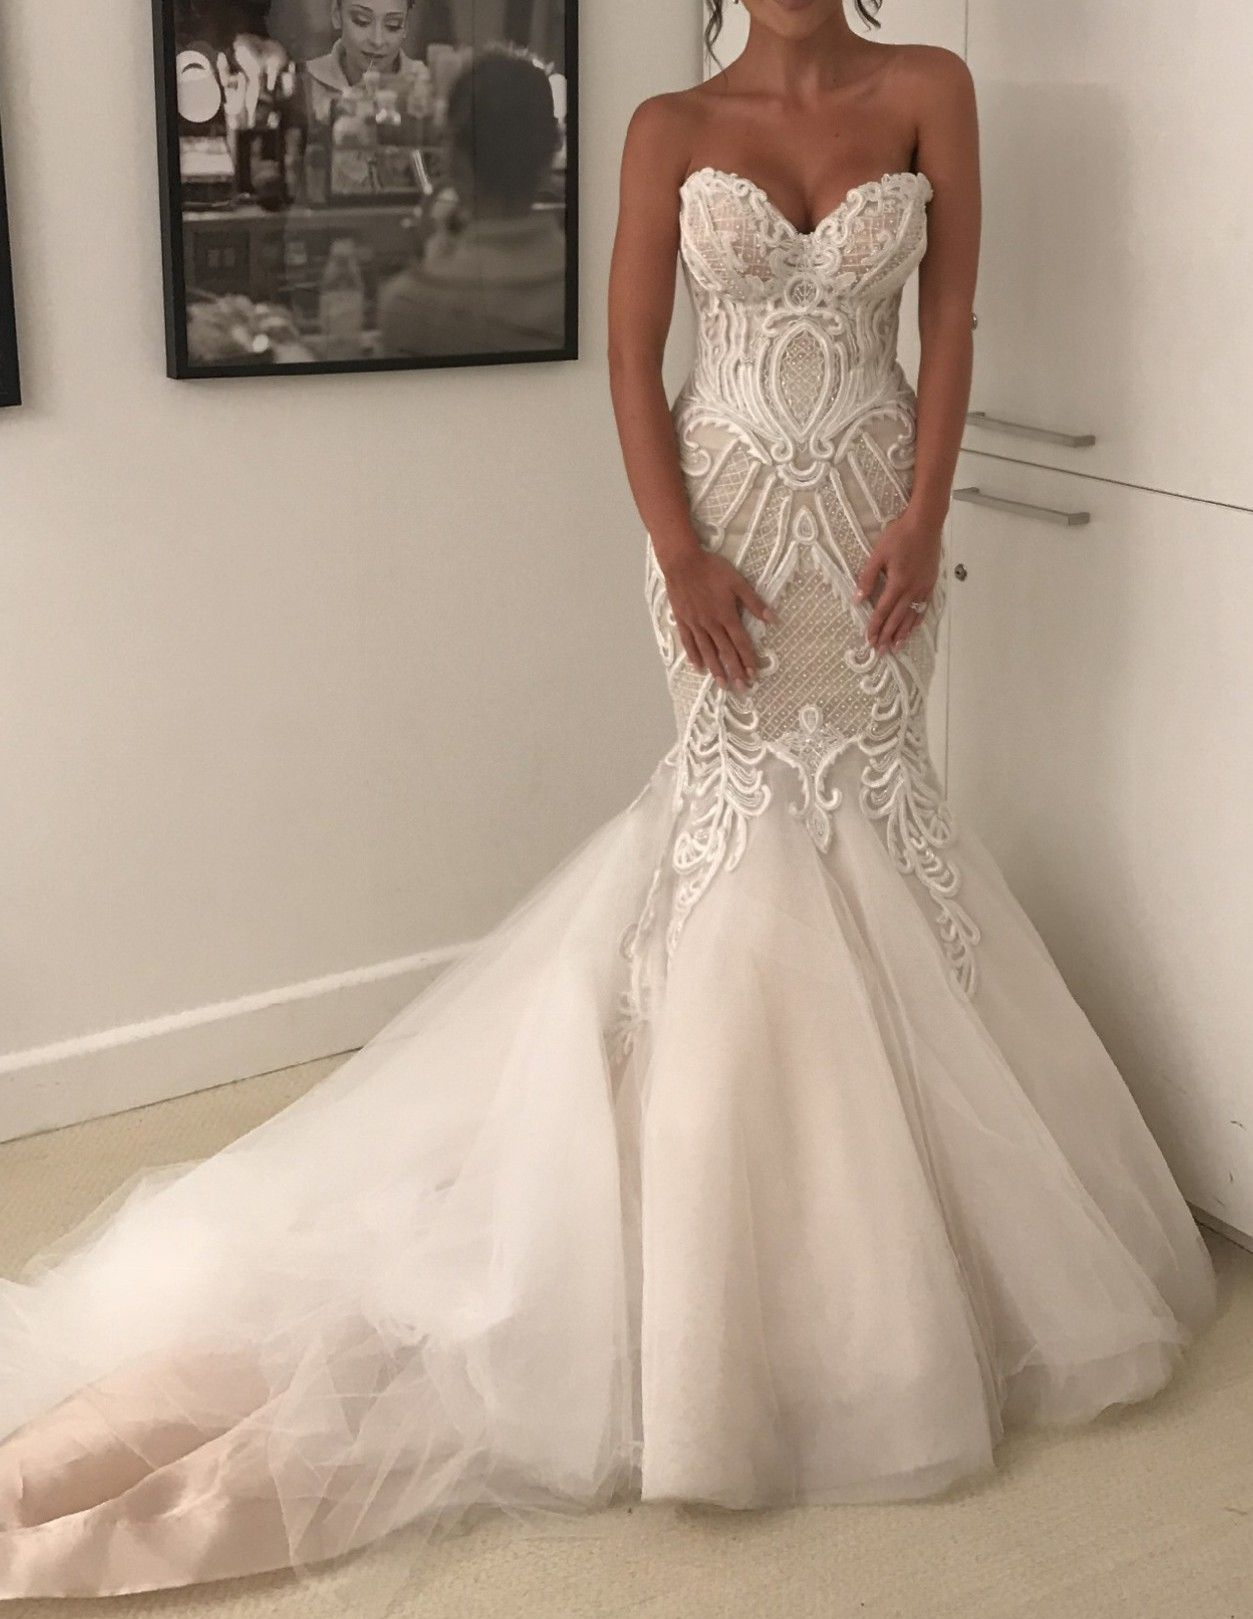 03ebd10c793c2 Norma And Lili Bridal Couture Aleks Makra Wedding Dress on Sale